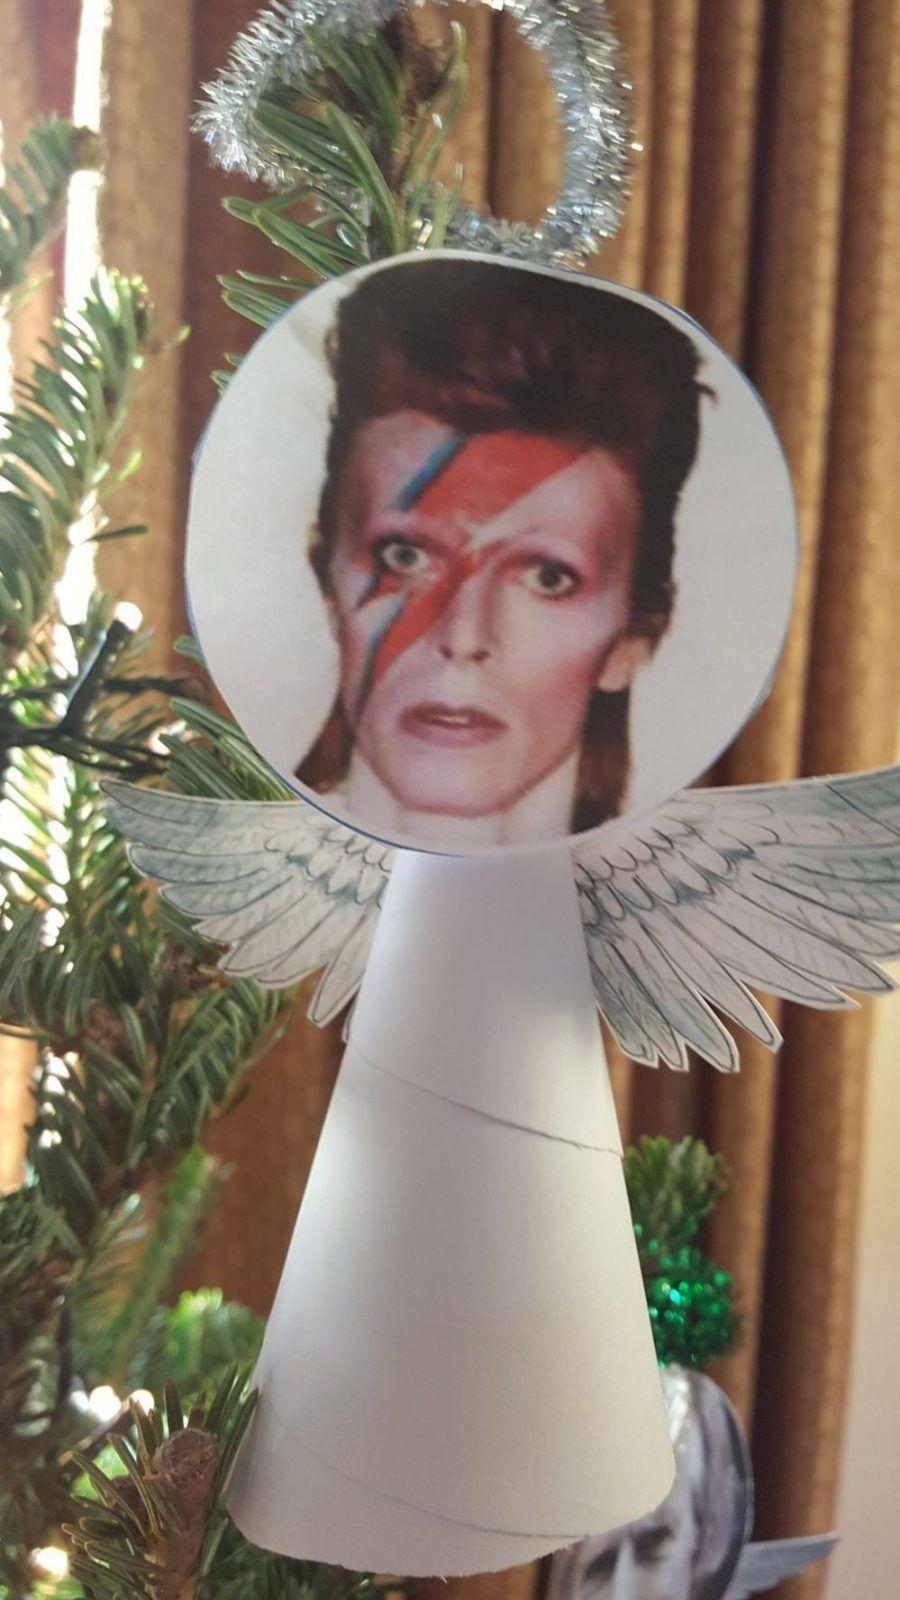 David Bowie non poteva mancare!